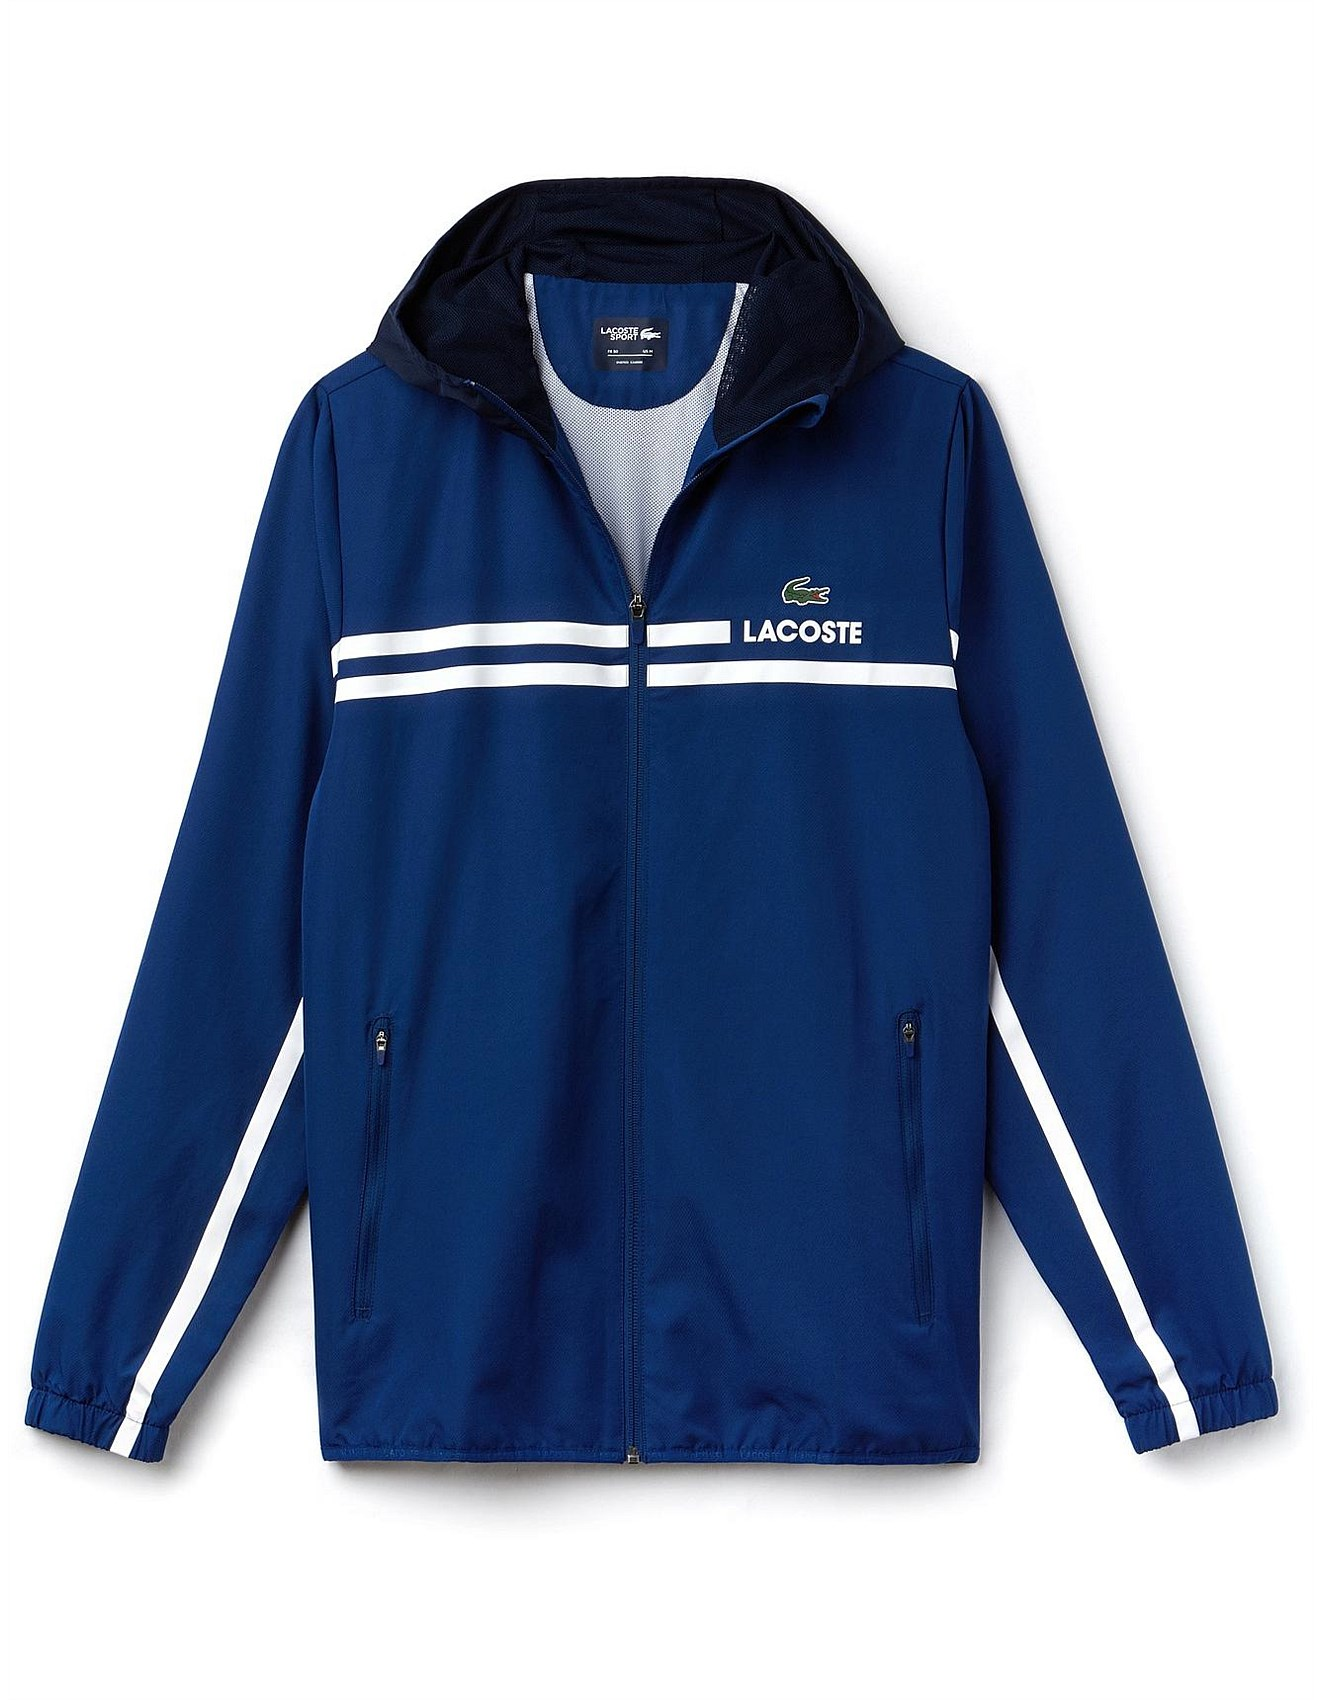 ff6108317 Retro Logo Jacket